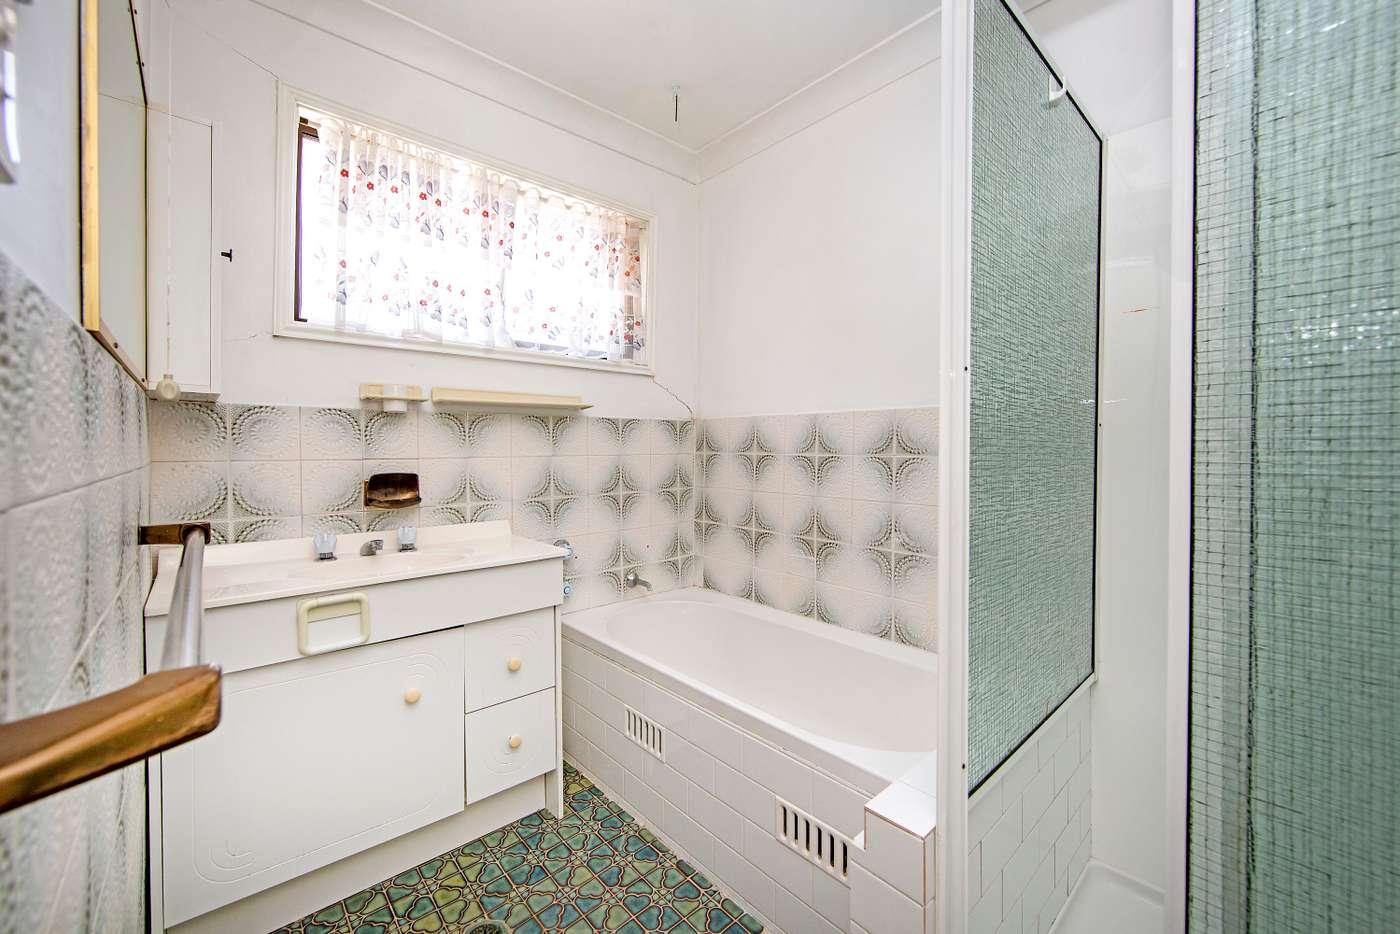 Seventh view of Homely house listing, 21 Lilo Avenue, Halekulani NSW 2262